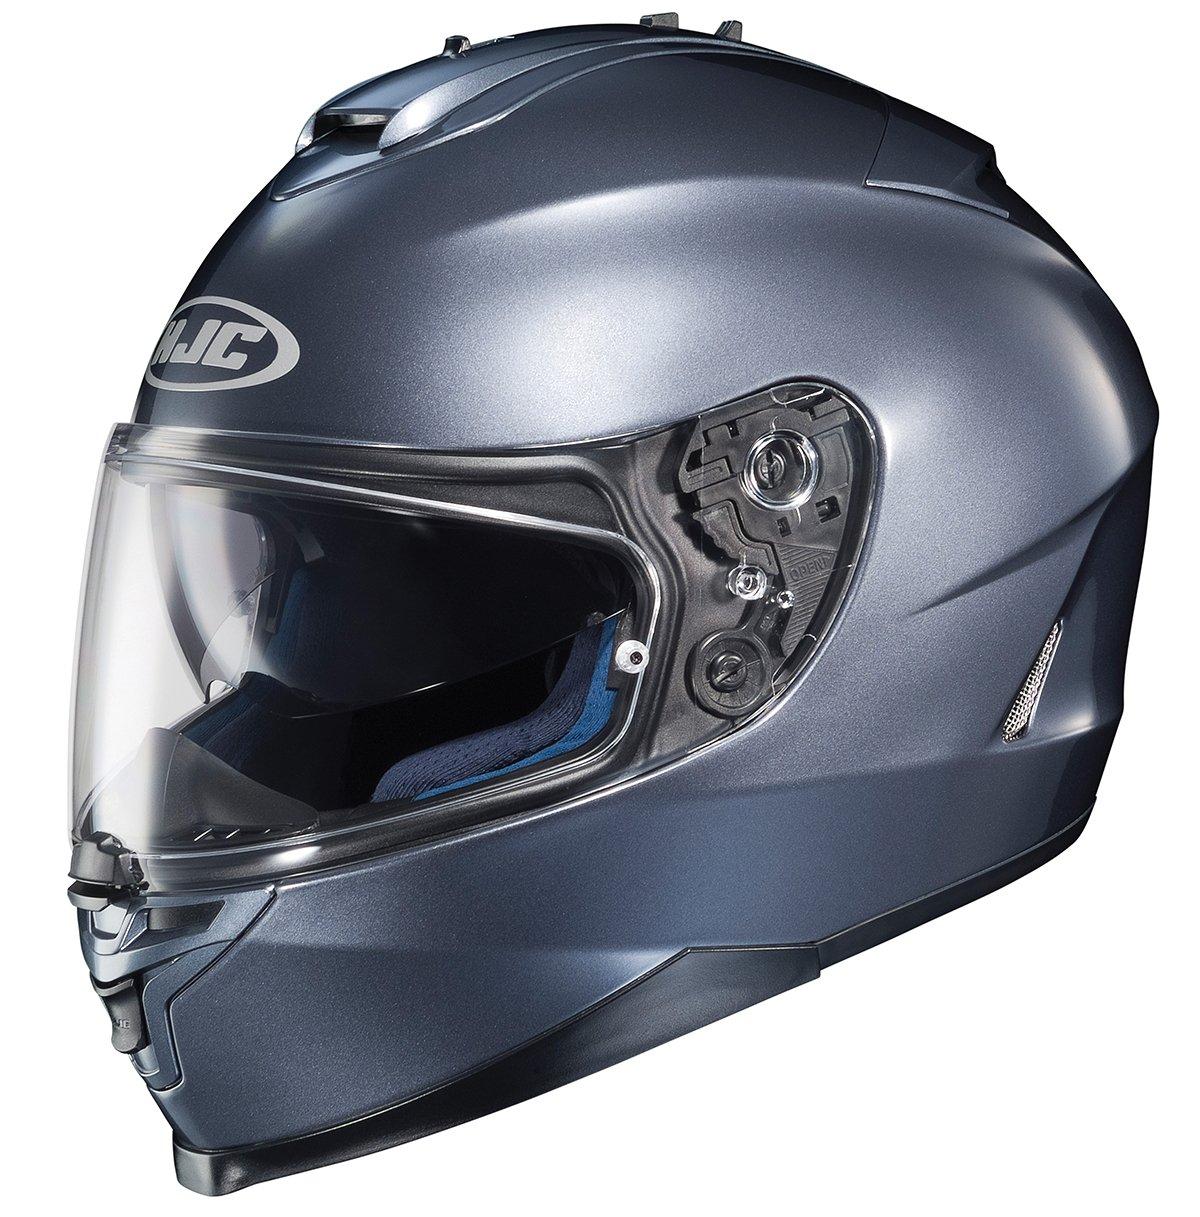 HJC 582-616 IS-17 Full-Face Motorcycle Helmet Matte Black, XX-Large